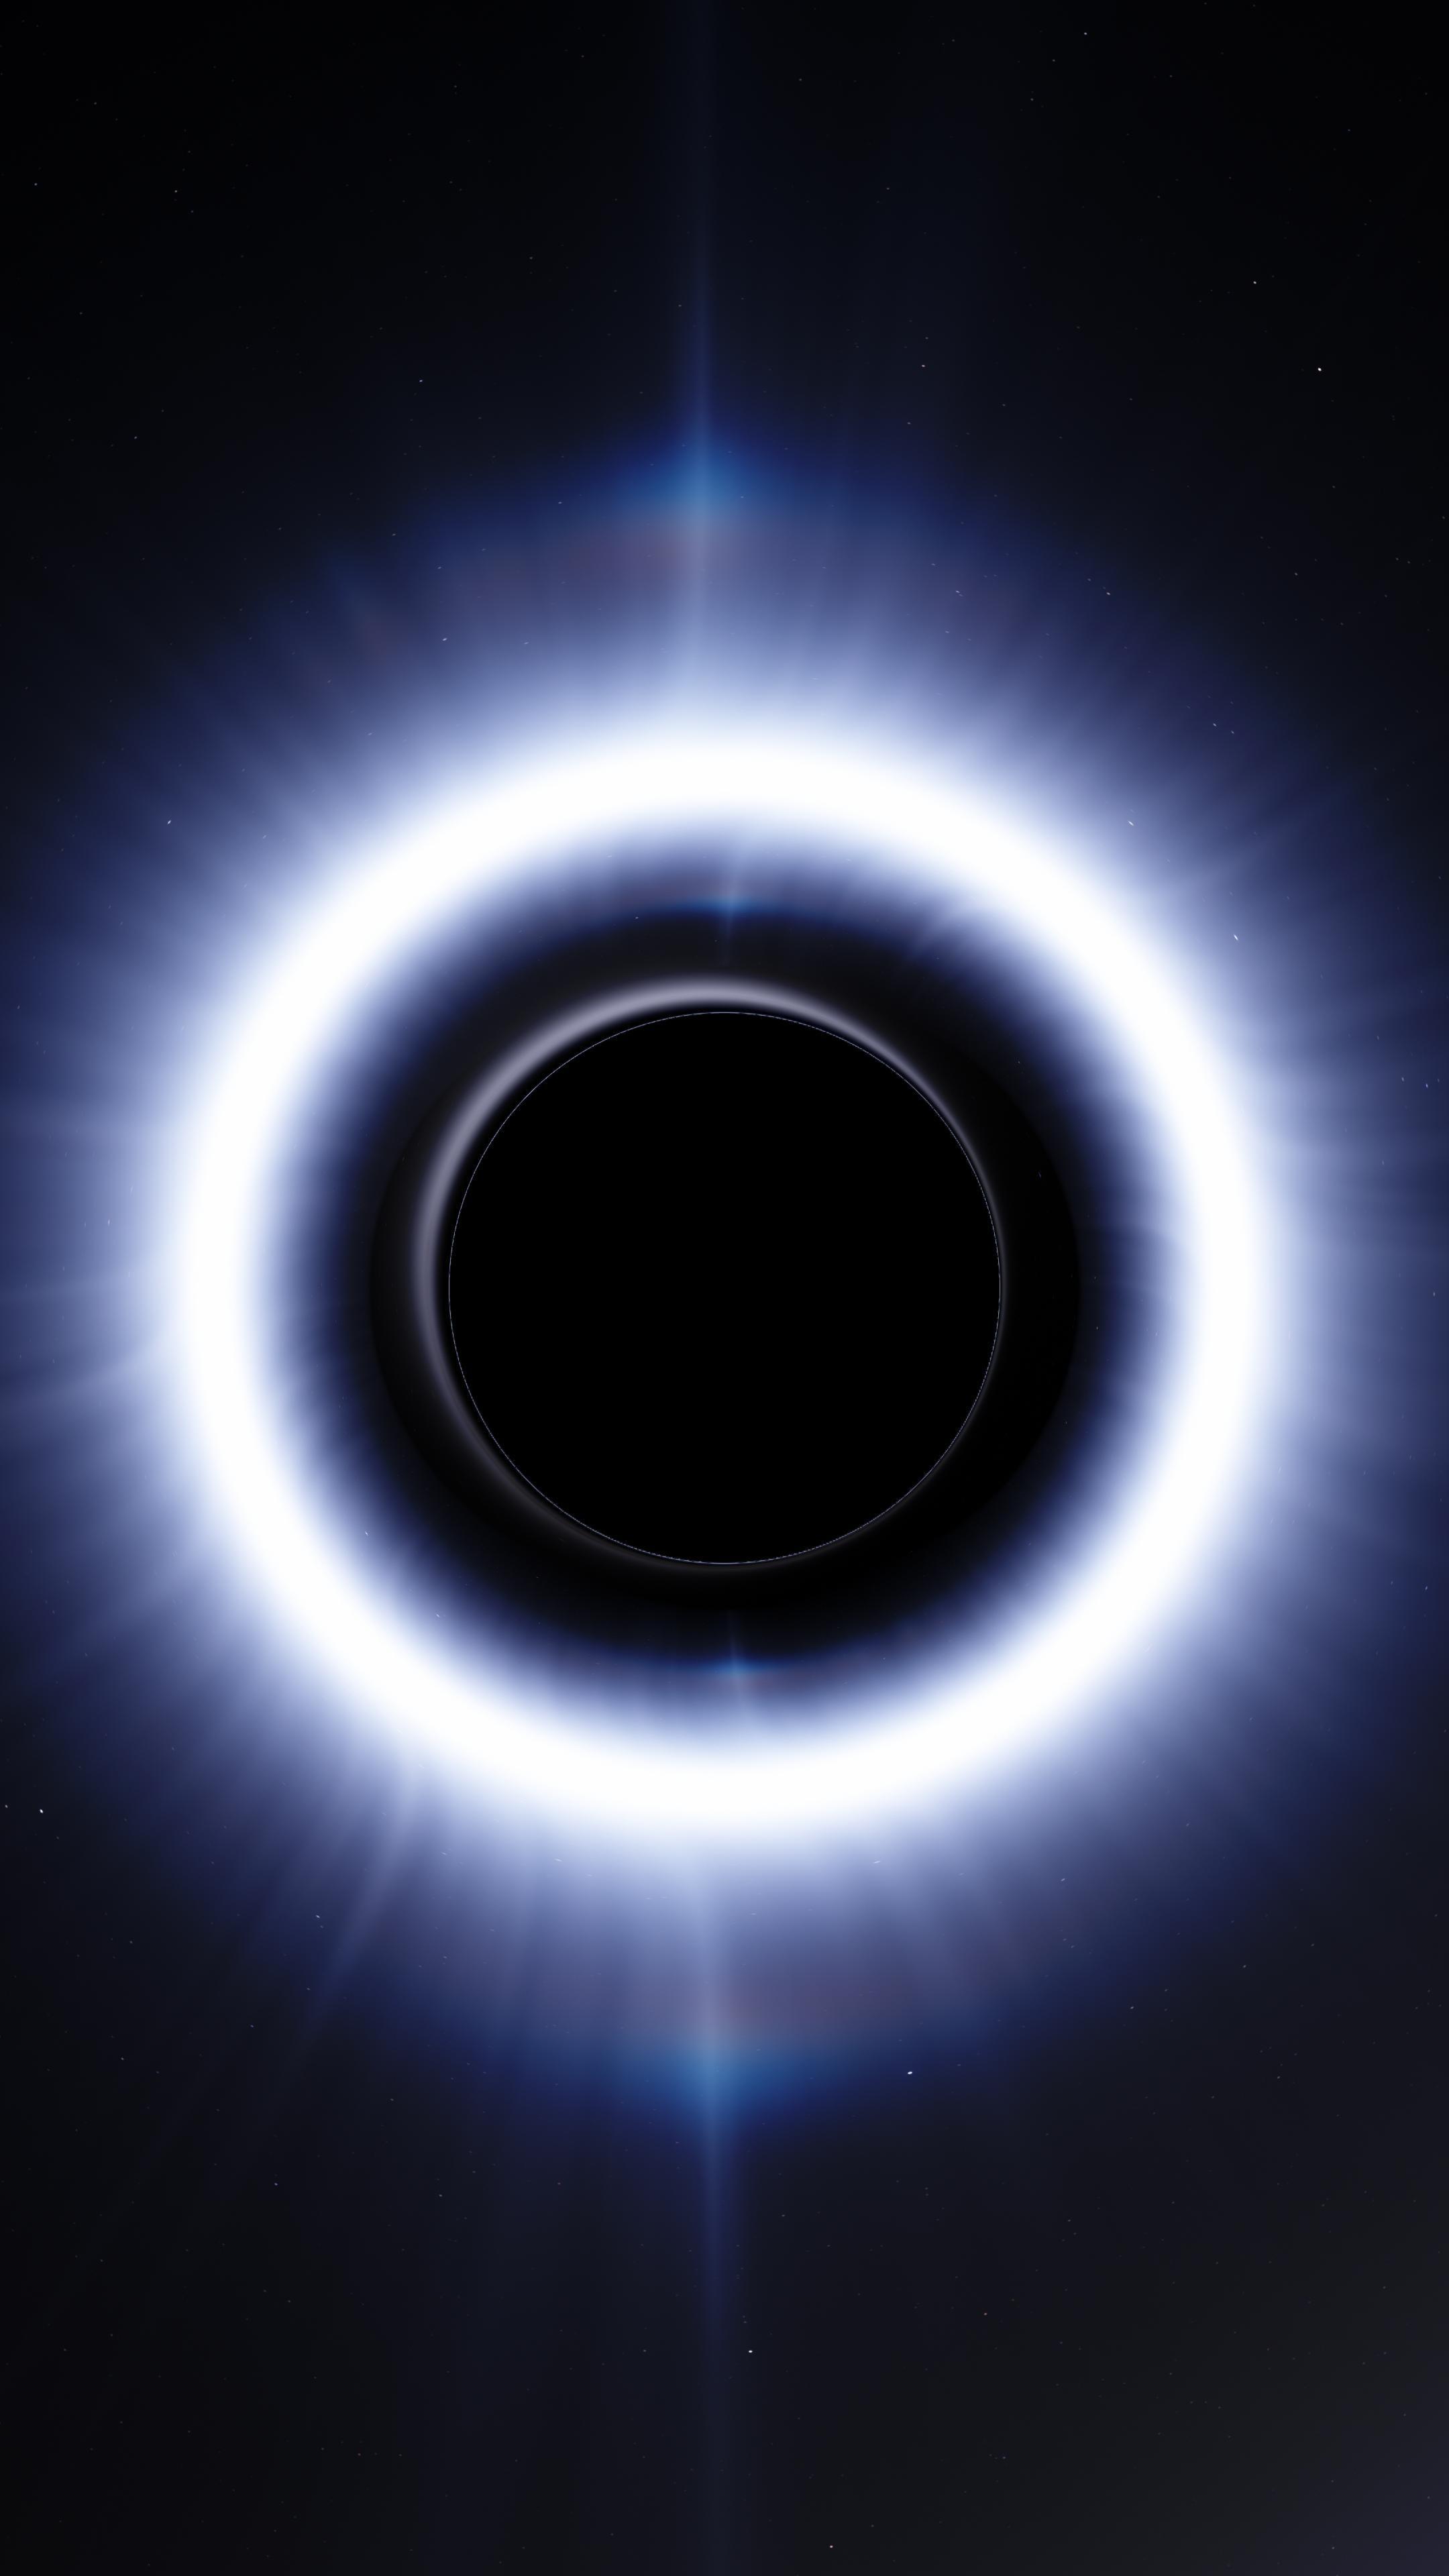 Black Hole Wallpaper 68 Images